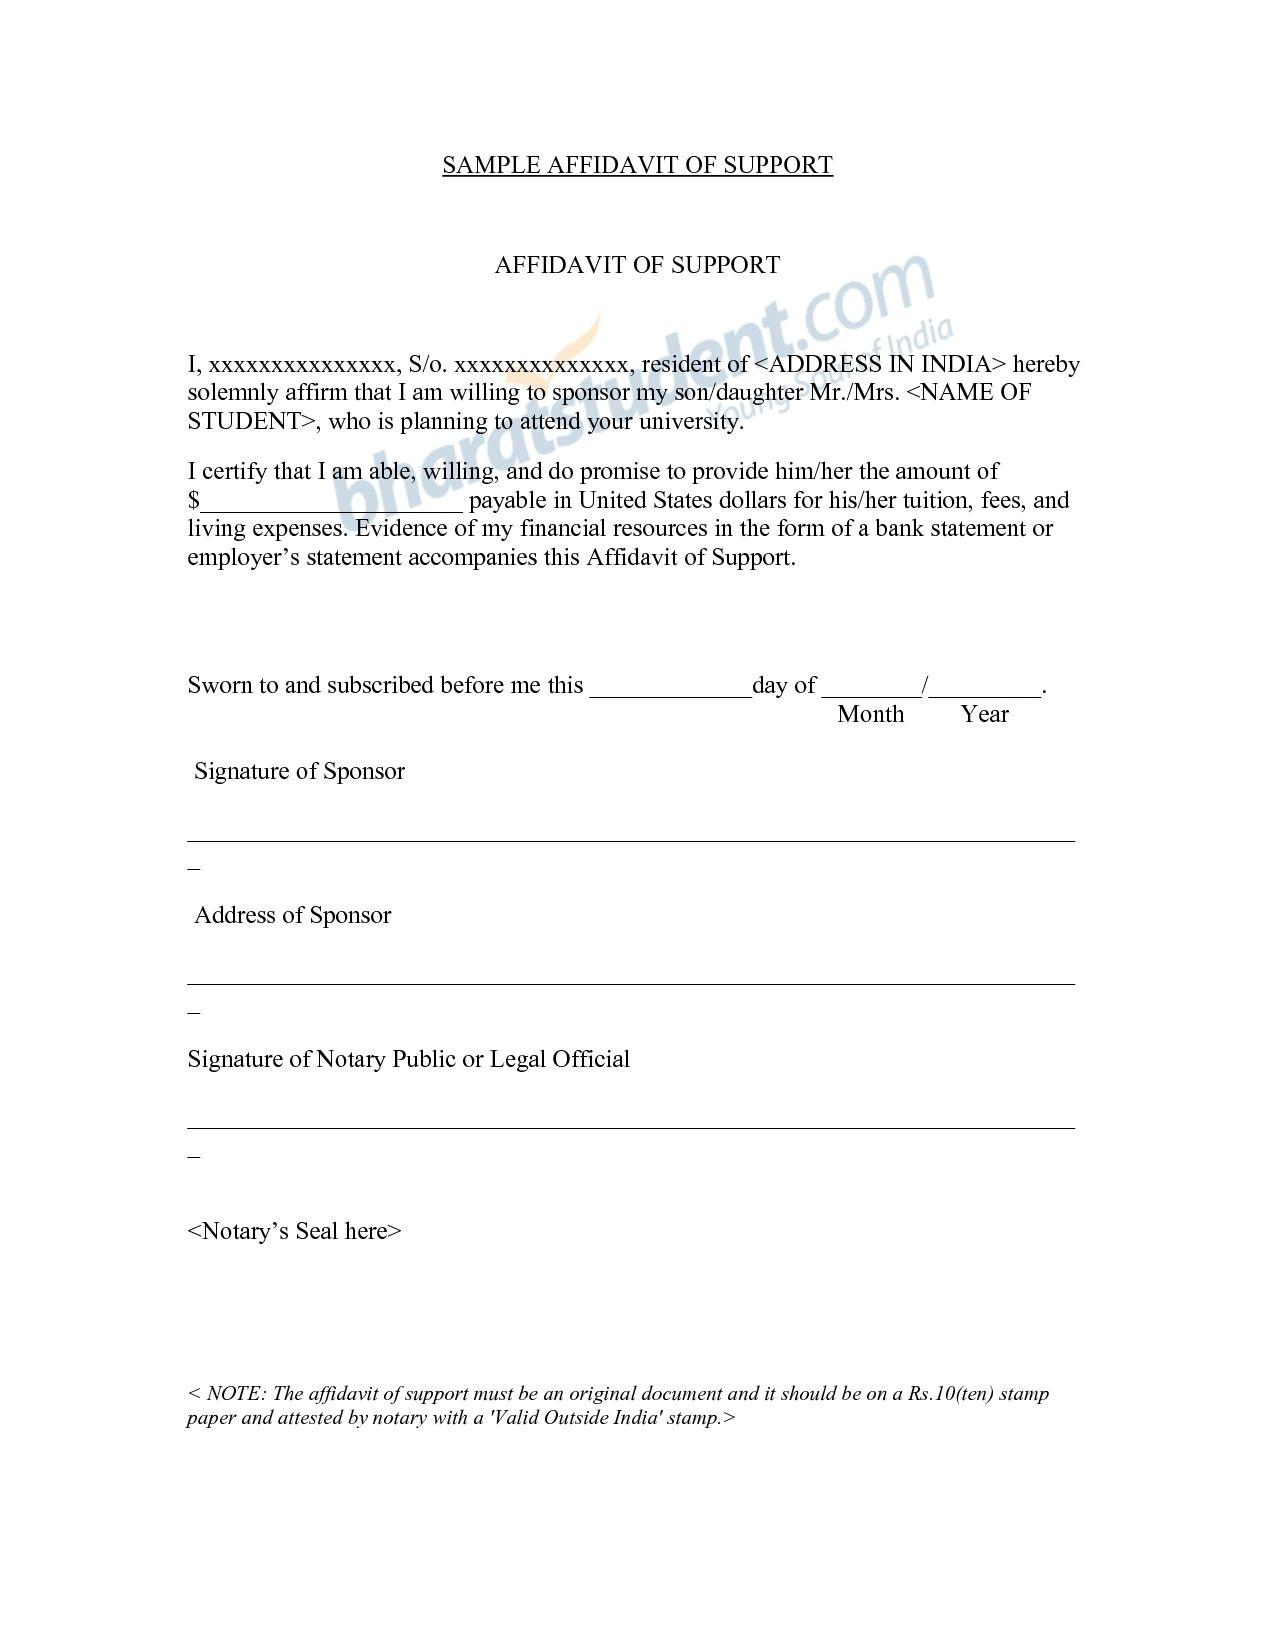 Affidavit Letter Samples Jianbochen Support Sample The